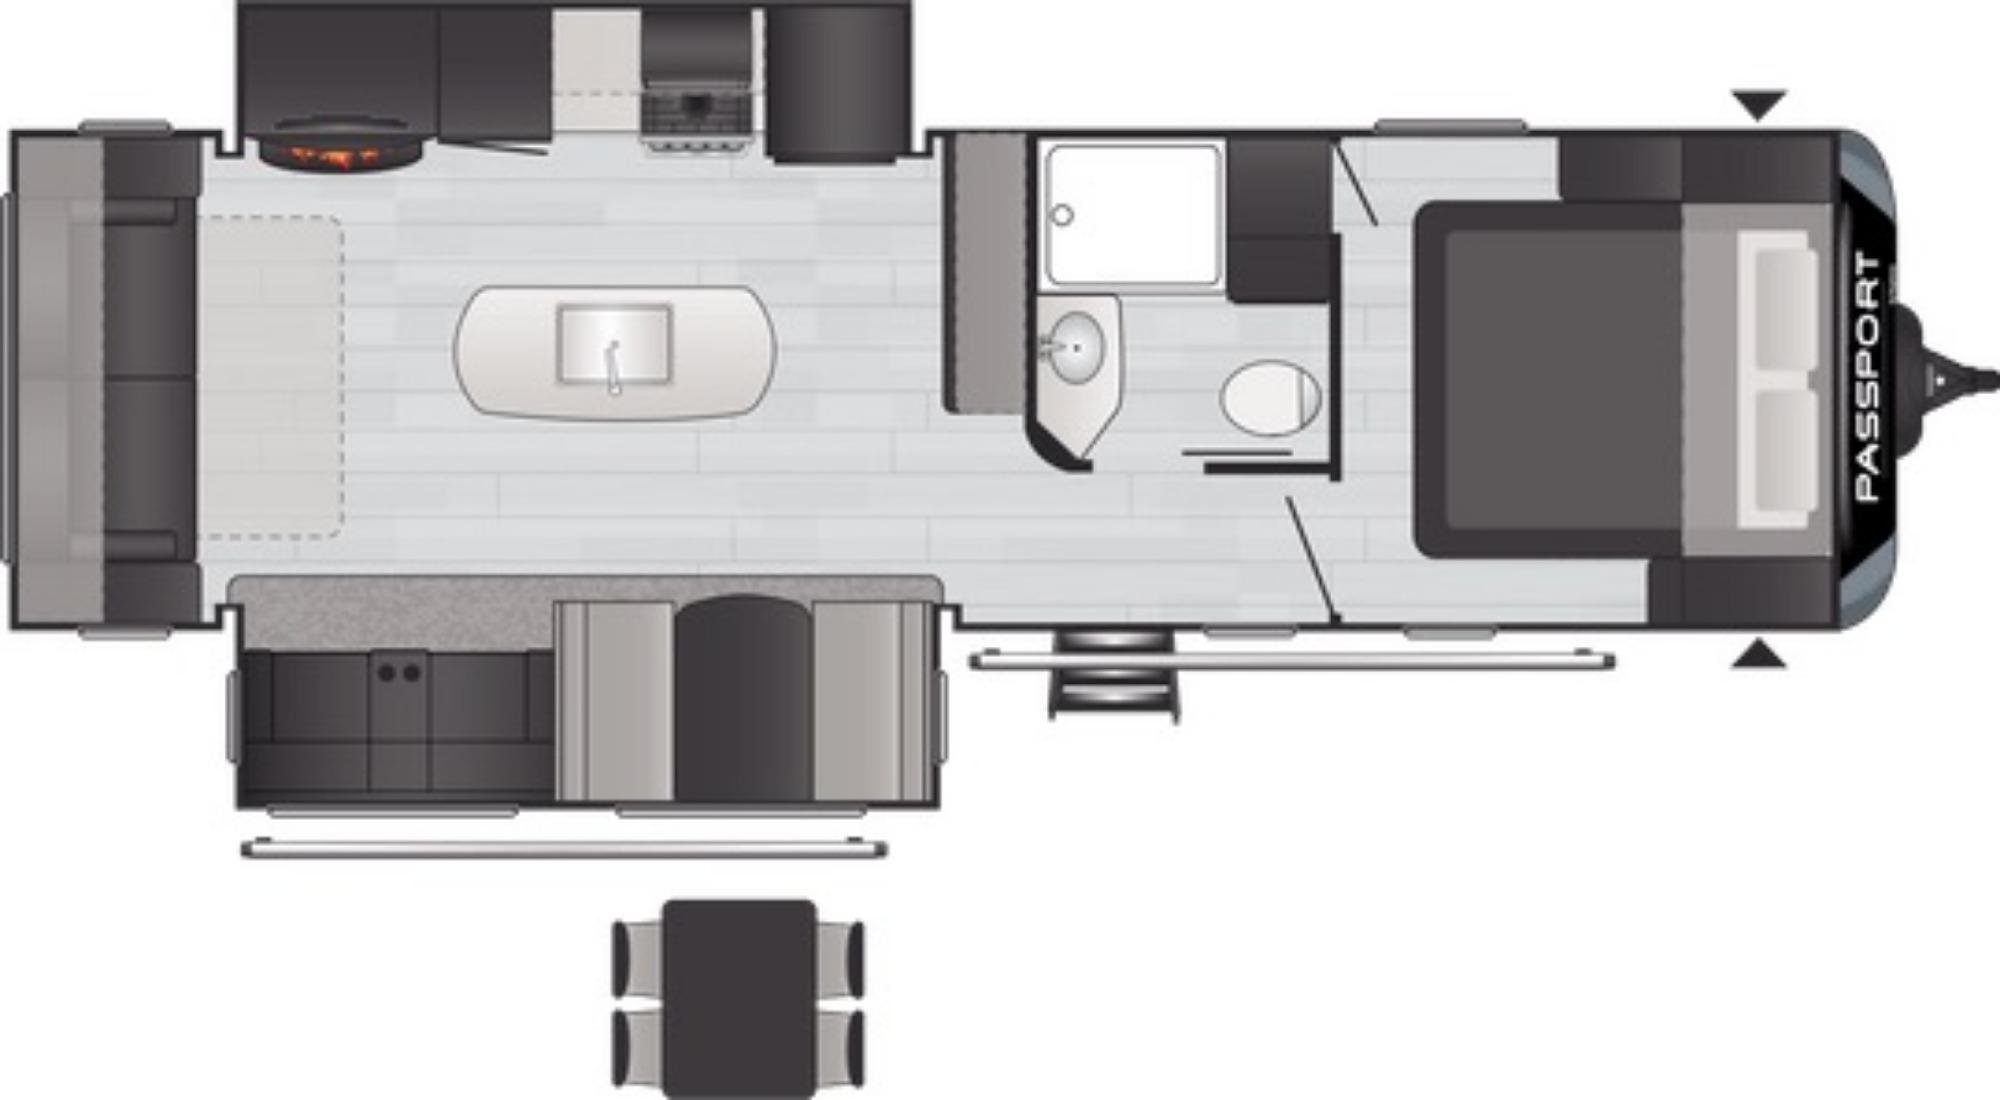 View Floor Plan for 2021 KEYSTONE PASSPORT 2870RLWE